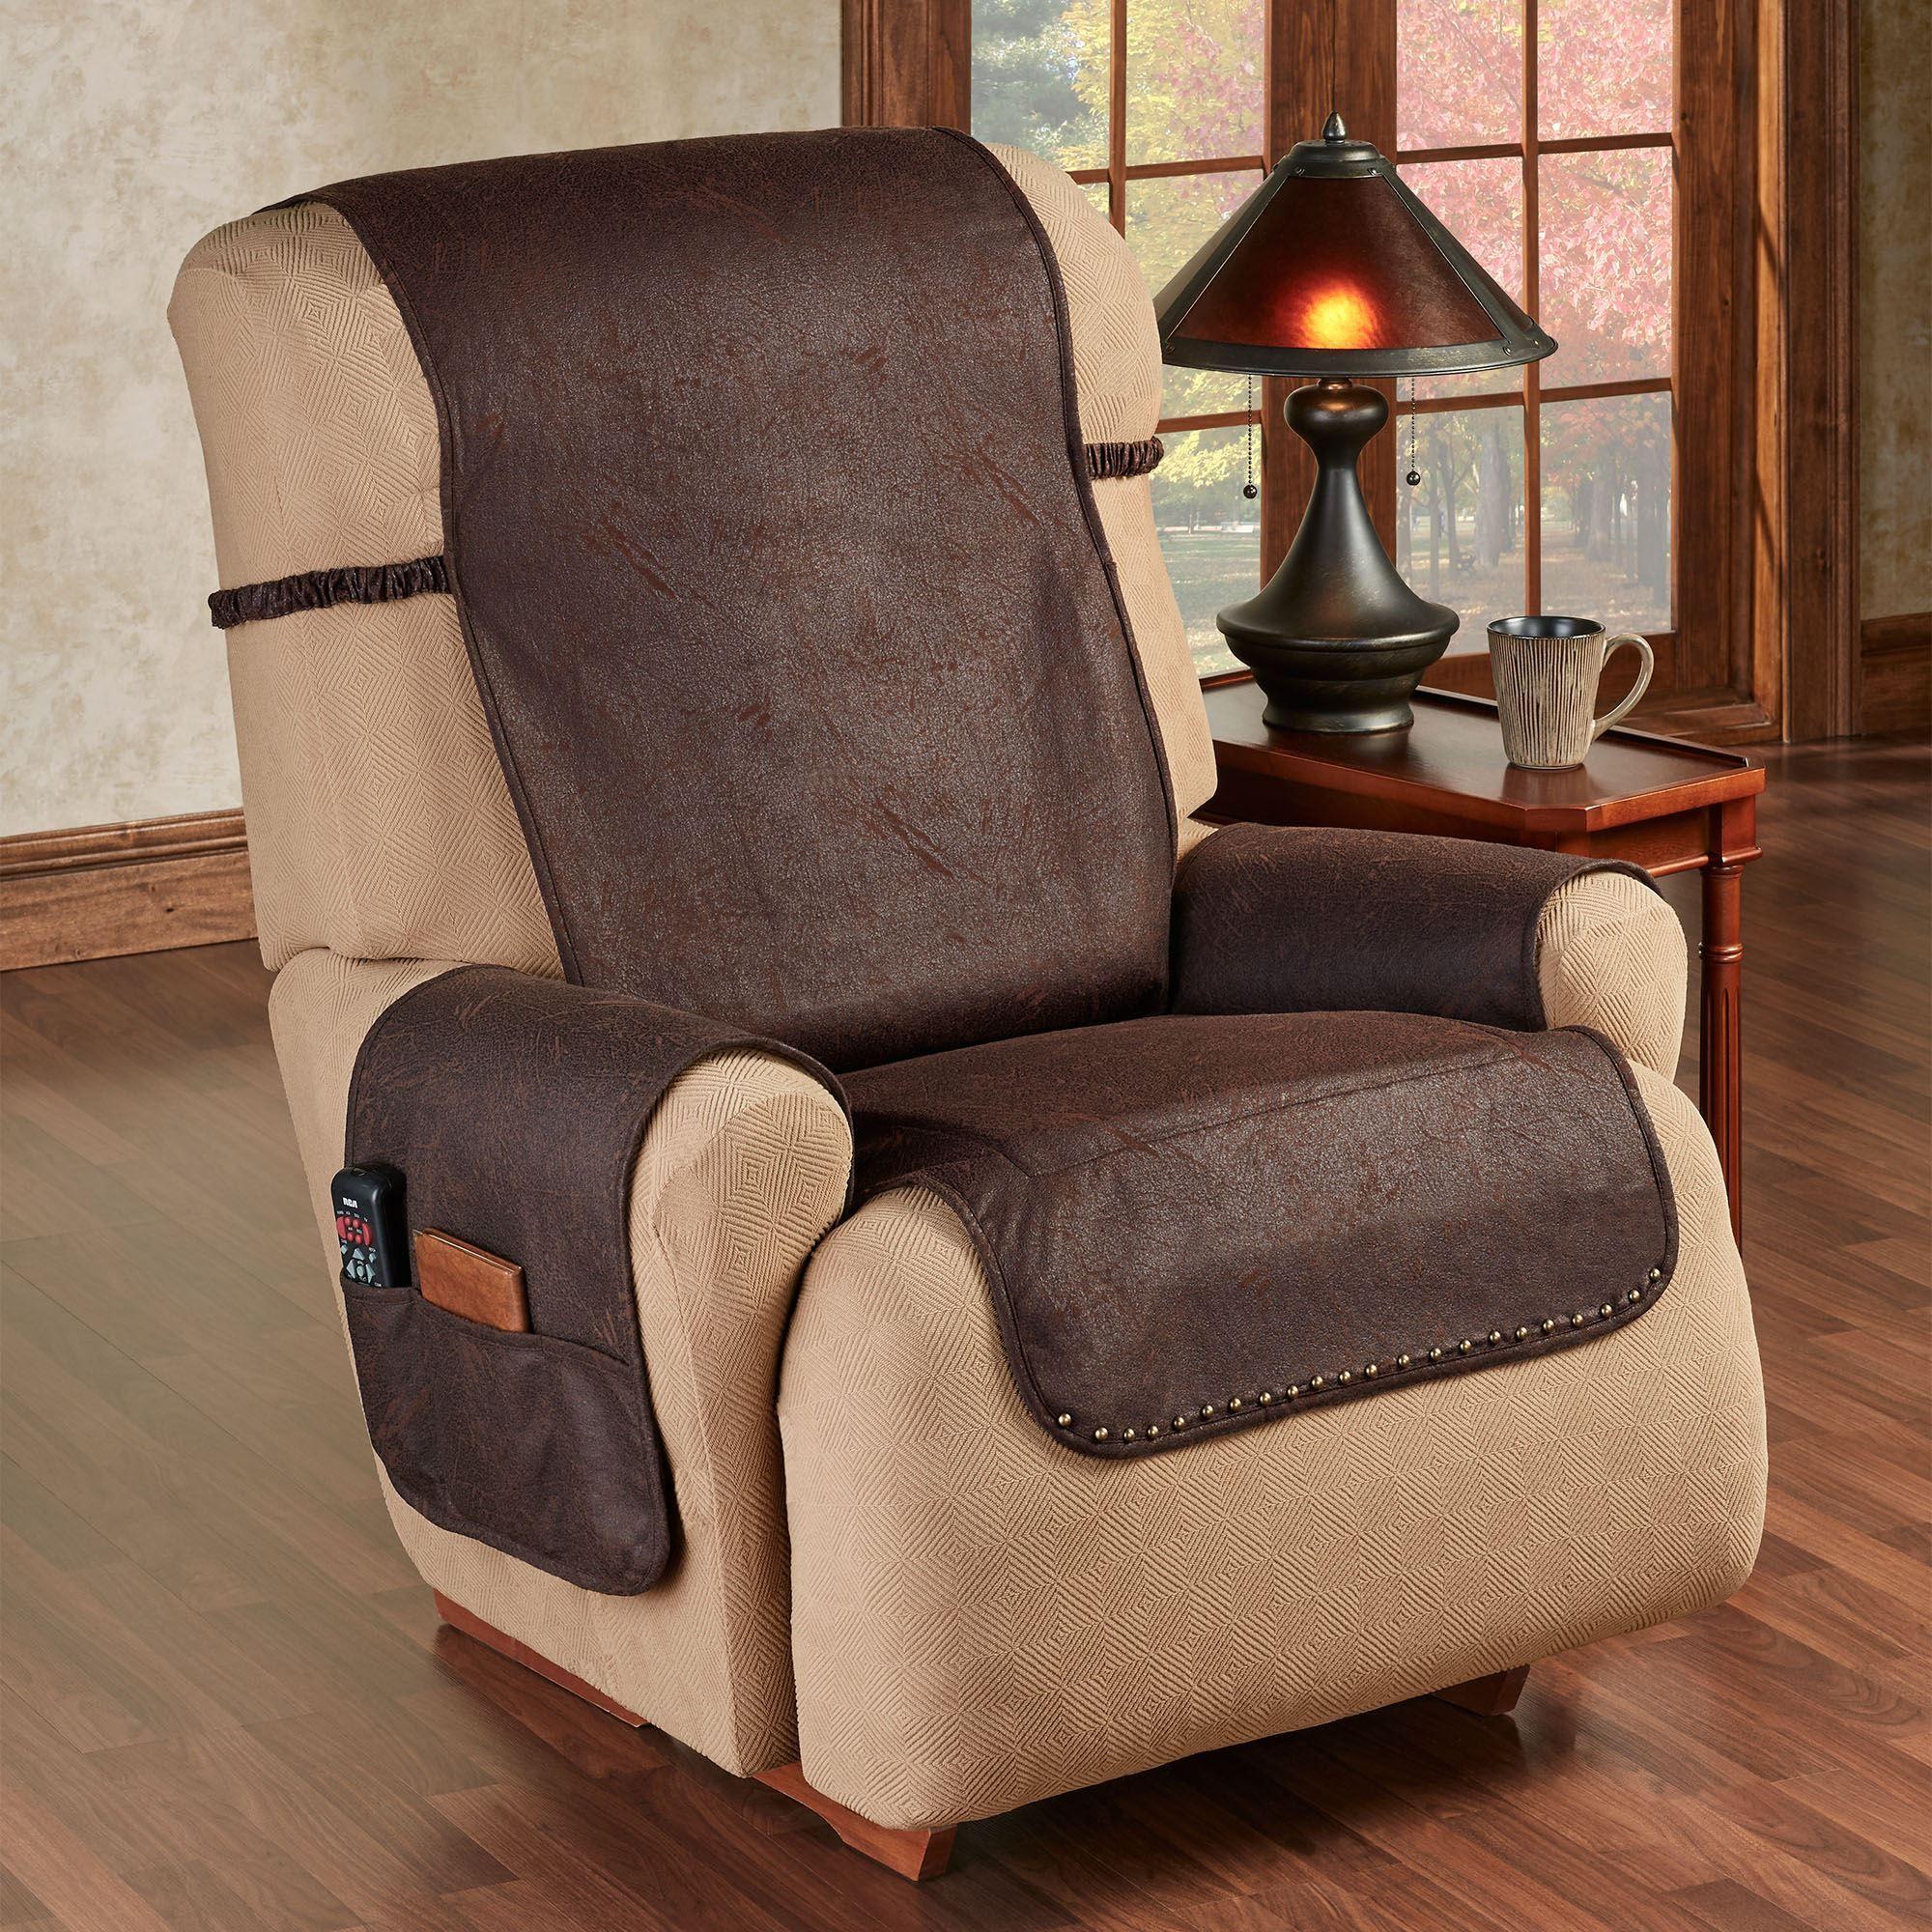 Stonehill Chocolate Slip Resistant Recliner Furniture